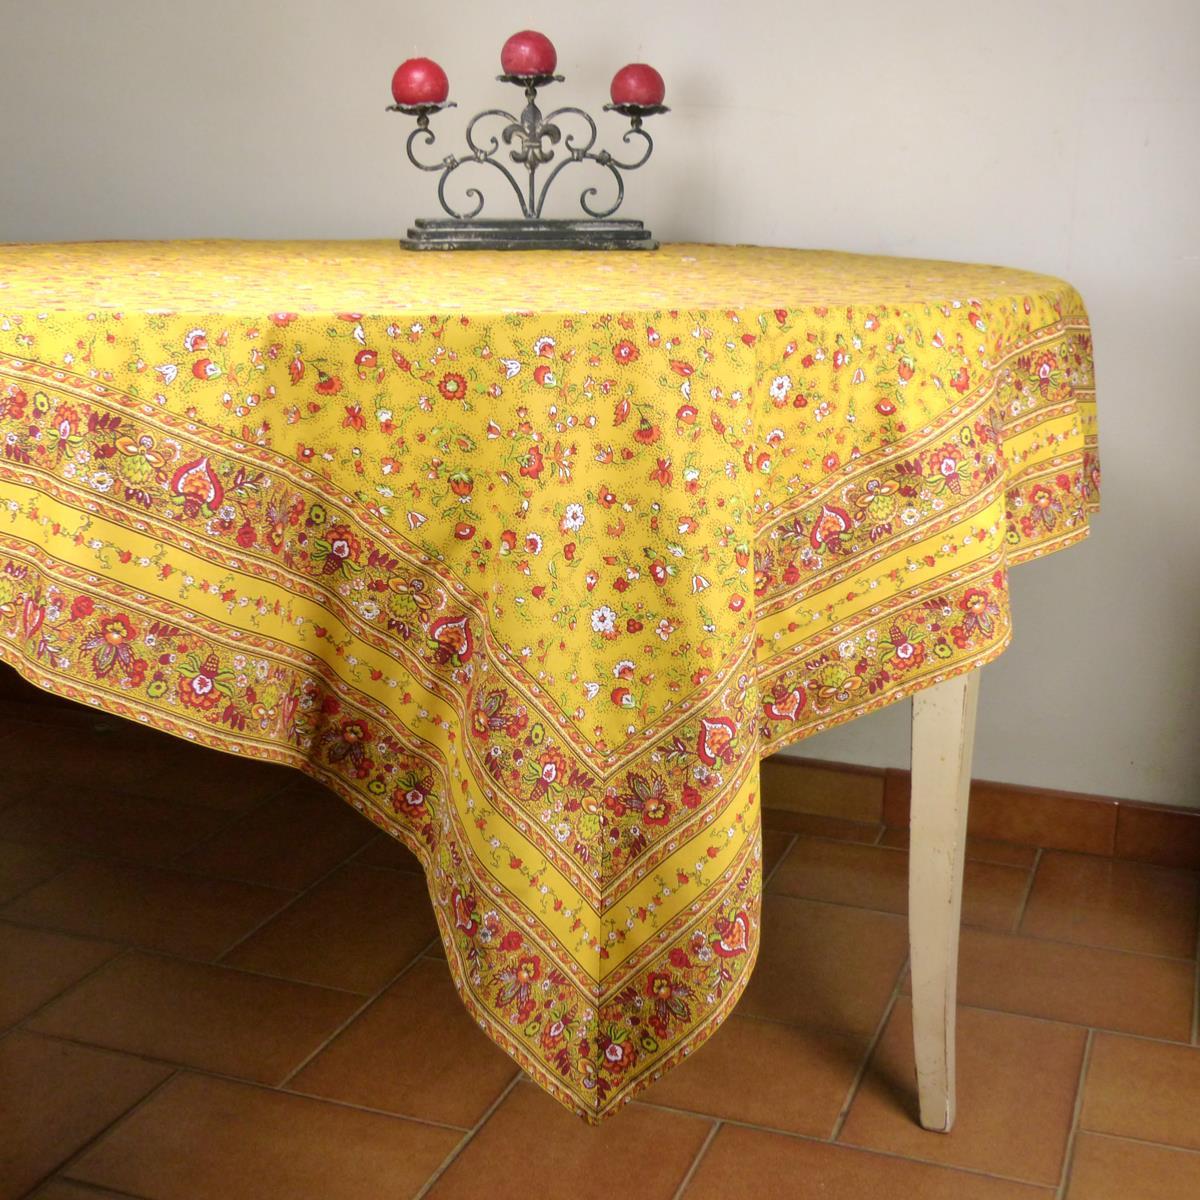 nappe carr e proven ale jaune motif champ tre nappe 100 coton fabrication fran aise. Black Bedroom Furniture Sets. Home Design Ideas